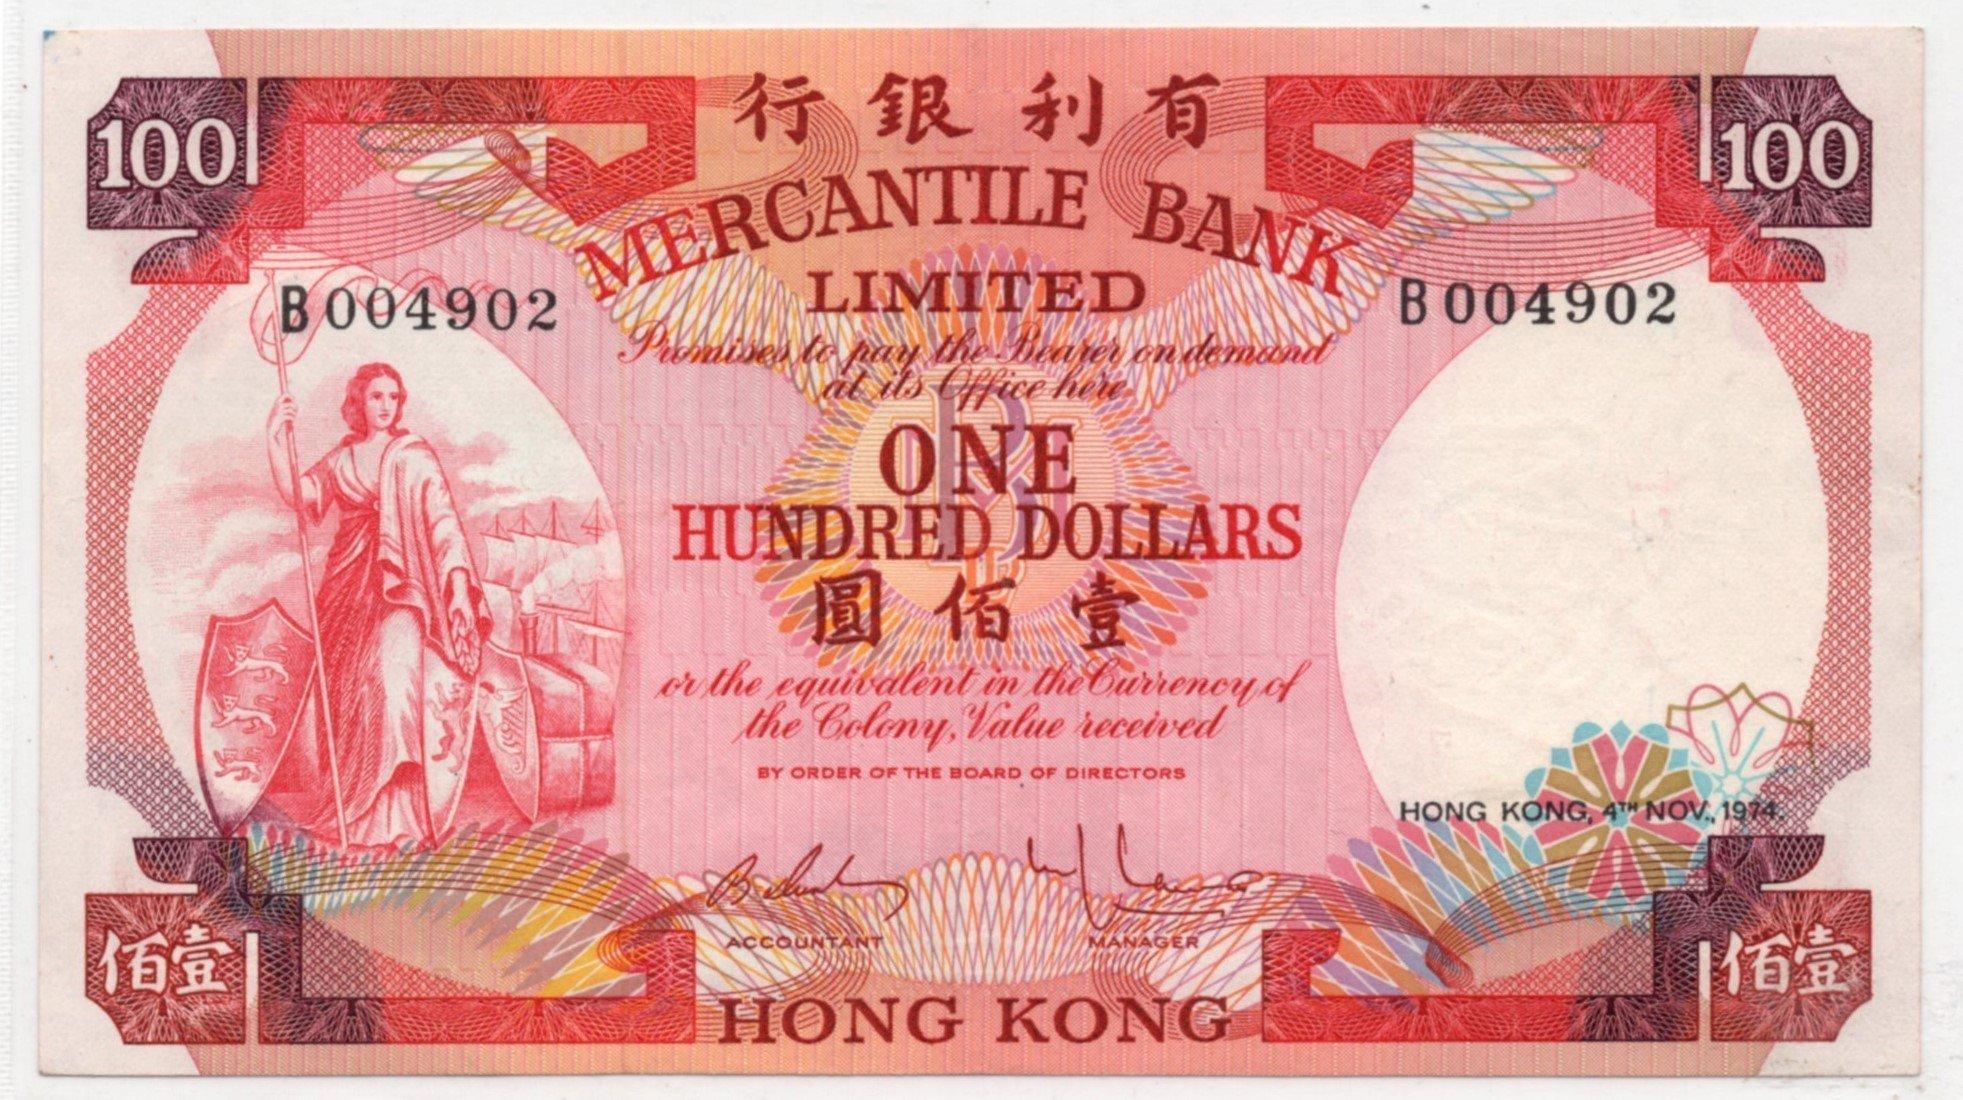 HK merantile